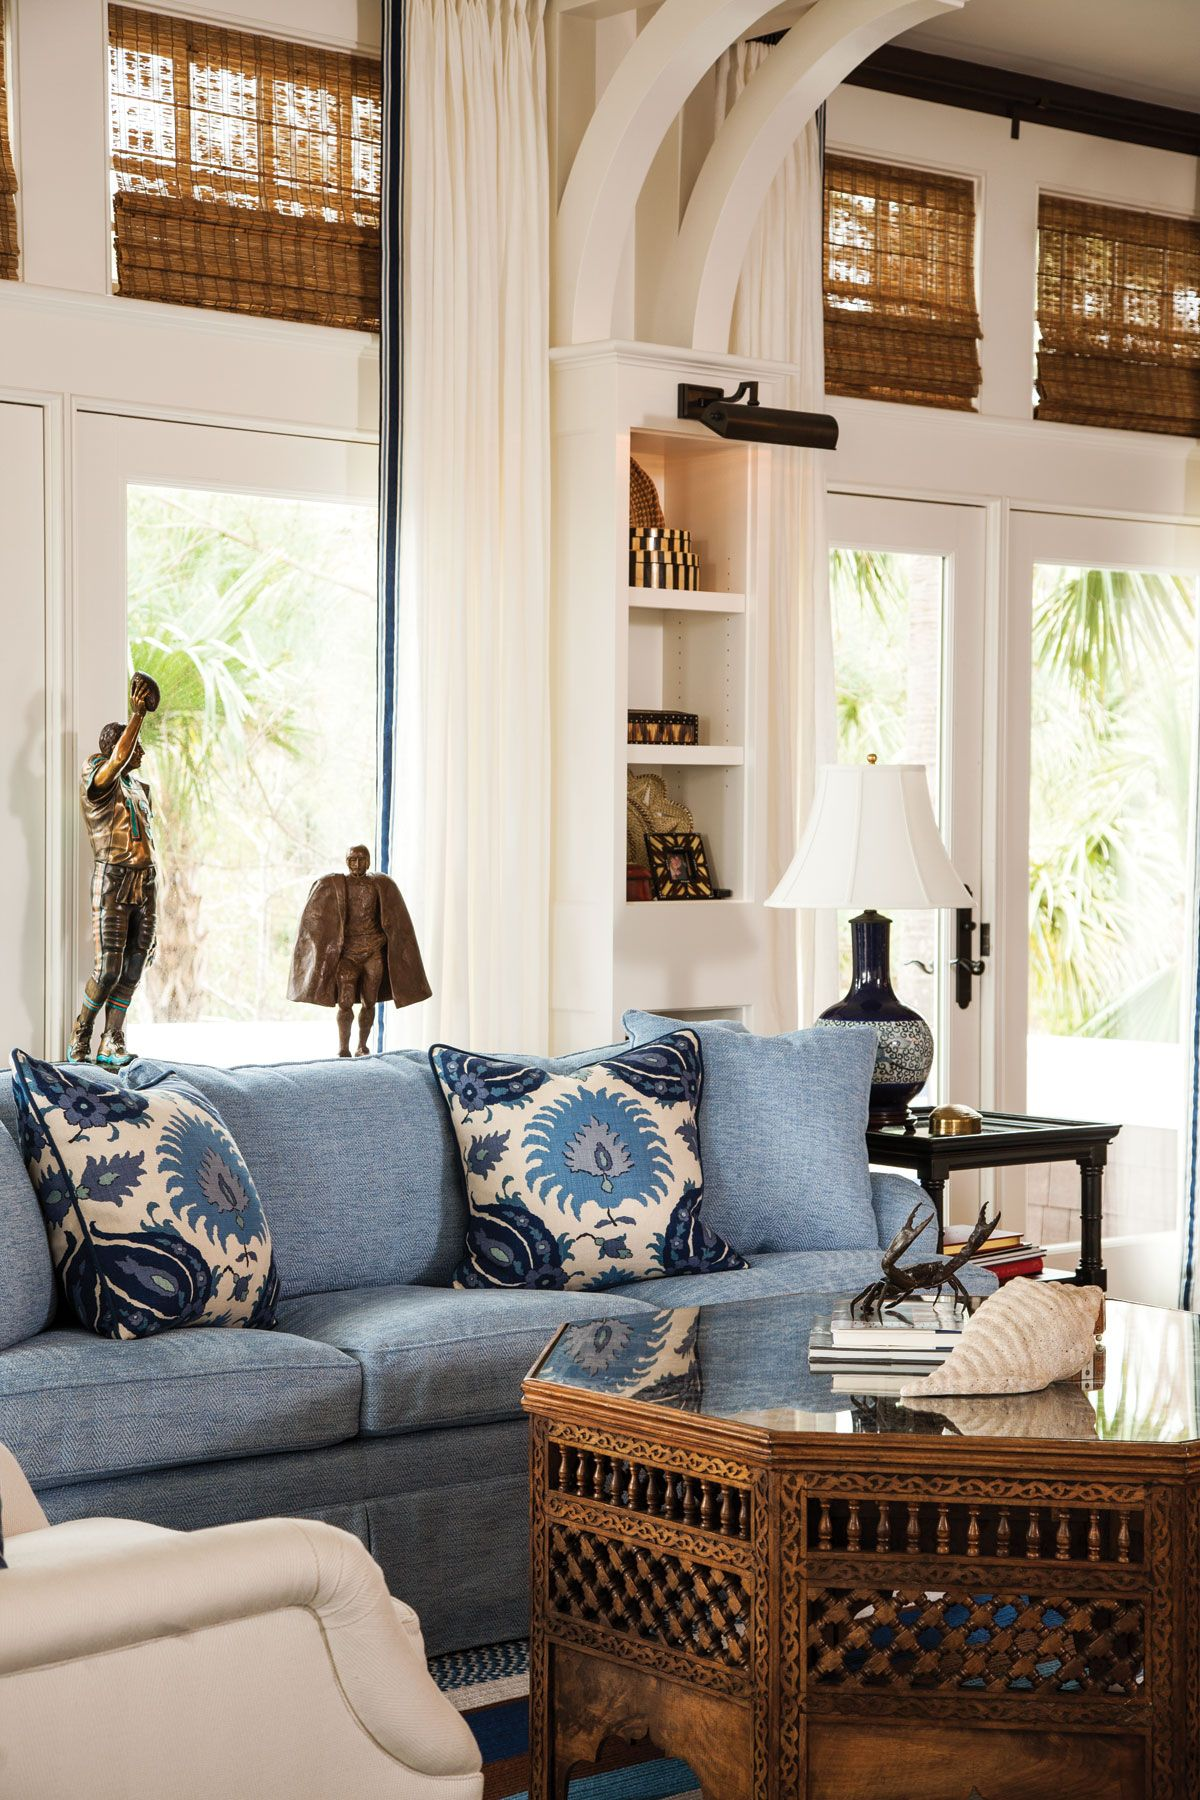 Home Florida Design Coastal Living Rooms Blue And White Living Room House Interior Florida living room furniture